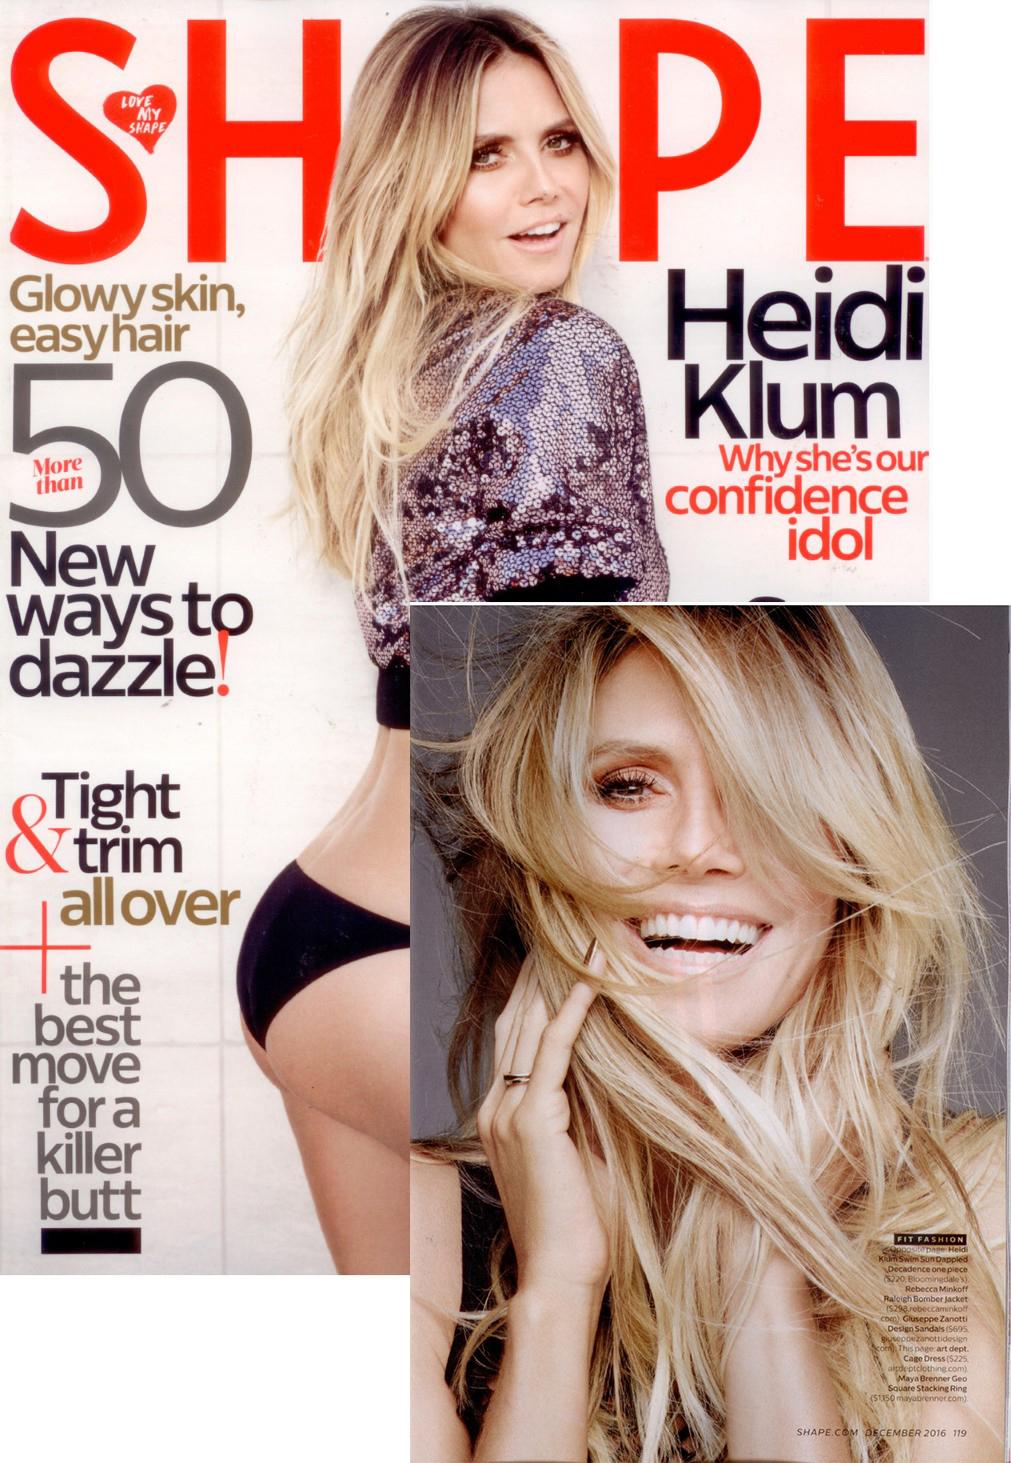 Heidi Klum on the Cover of Shape Magazine